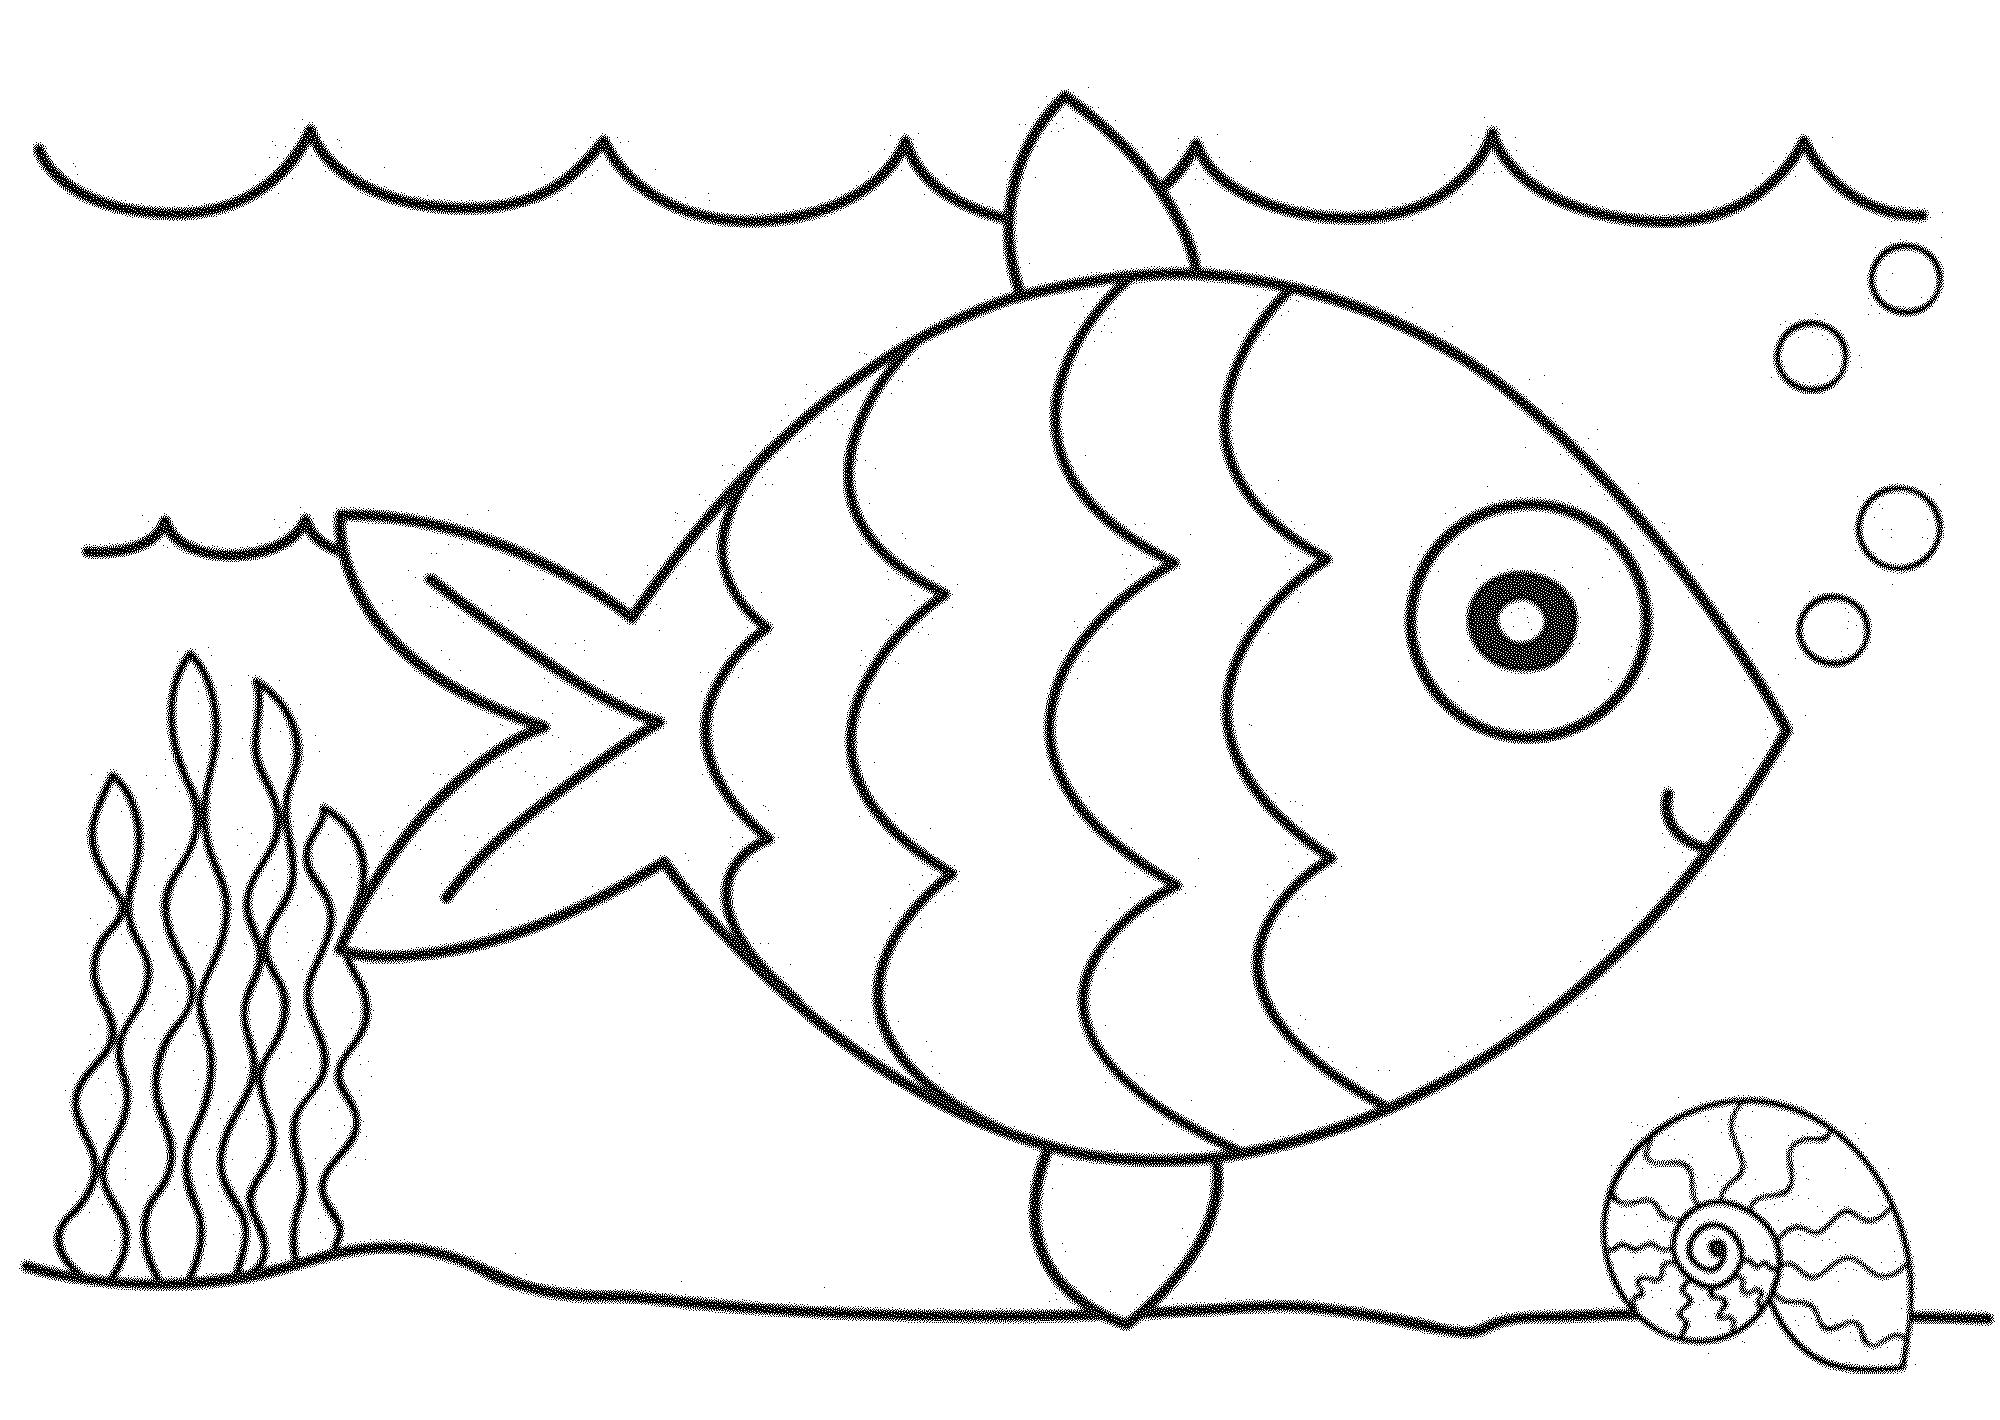 fish coloring worksheet fish coloring pages for kids preschool and kindergarten coloring fish worksheet